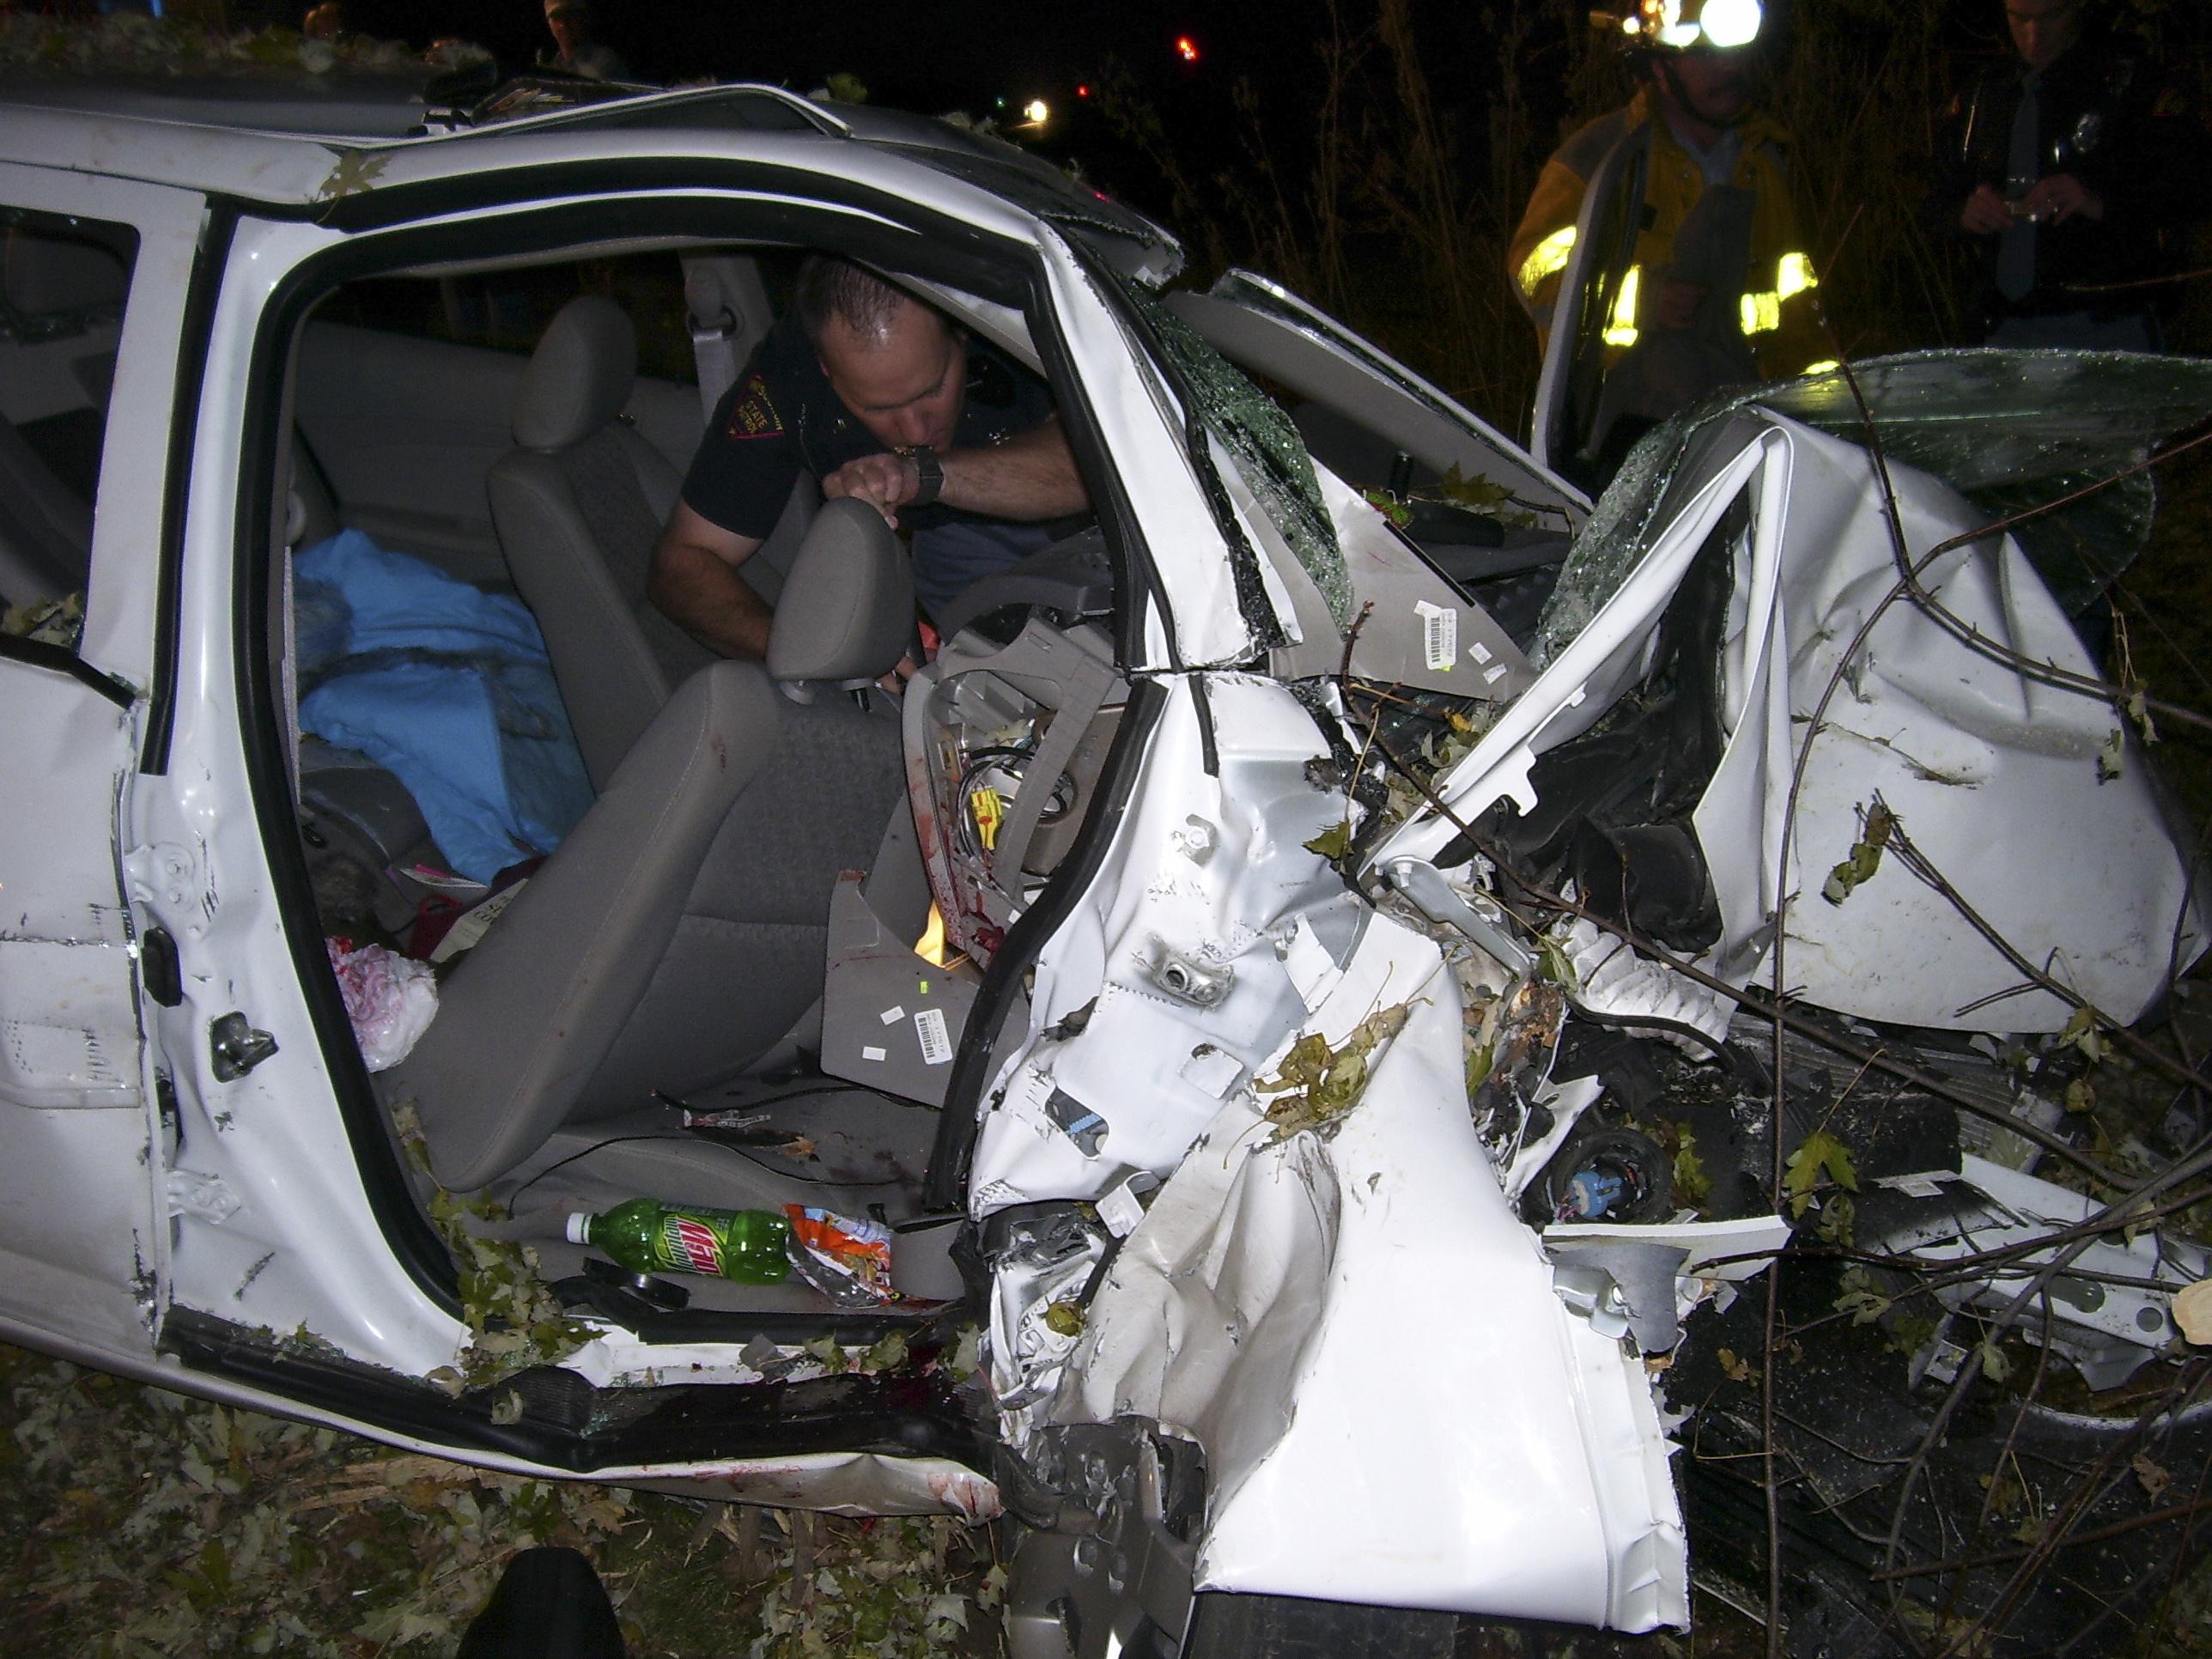 Driver killed in Houston crash in Honda with Takata air bags